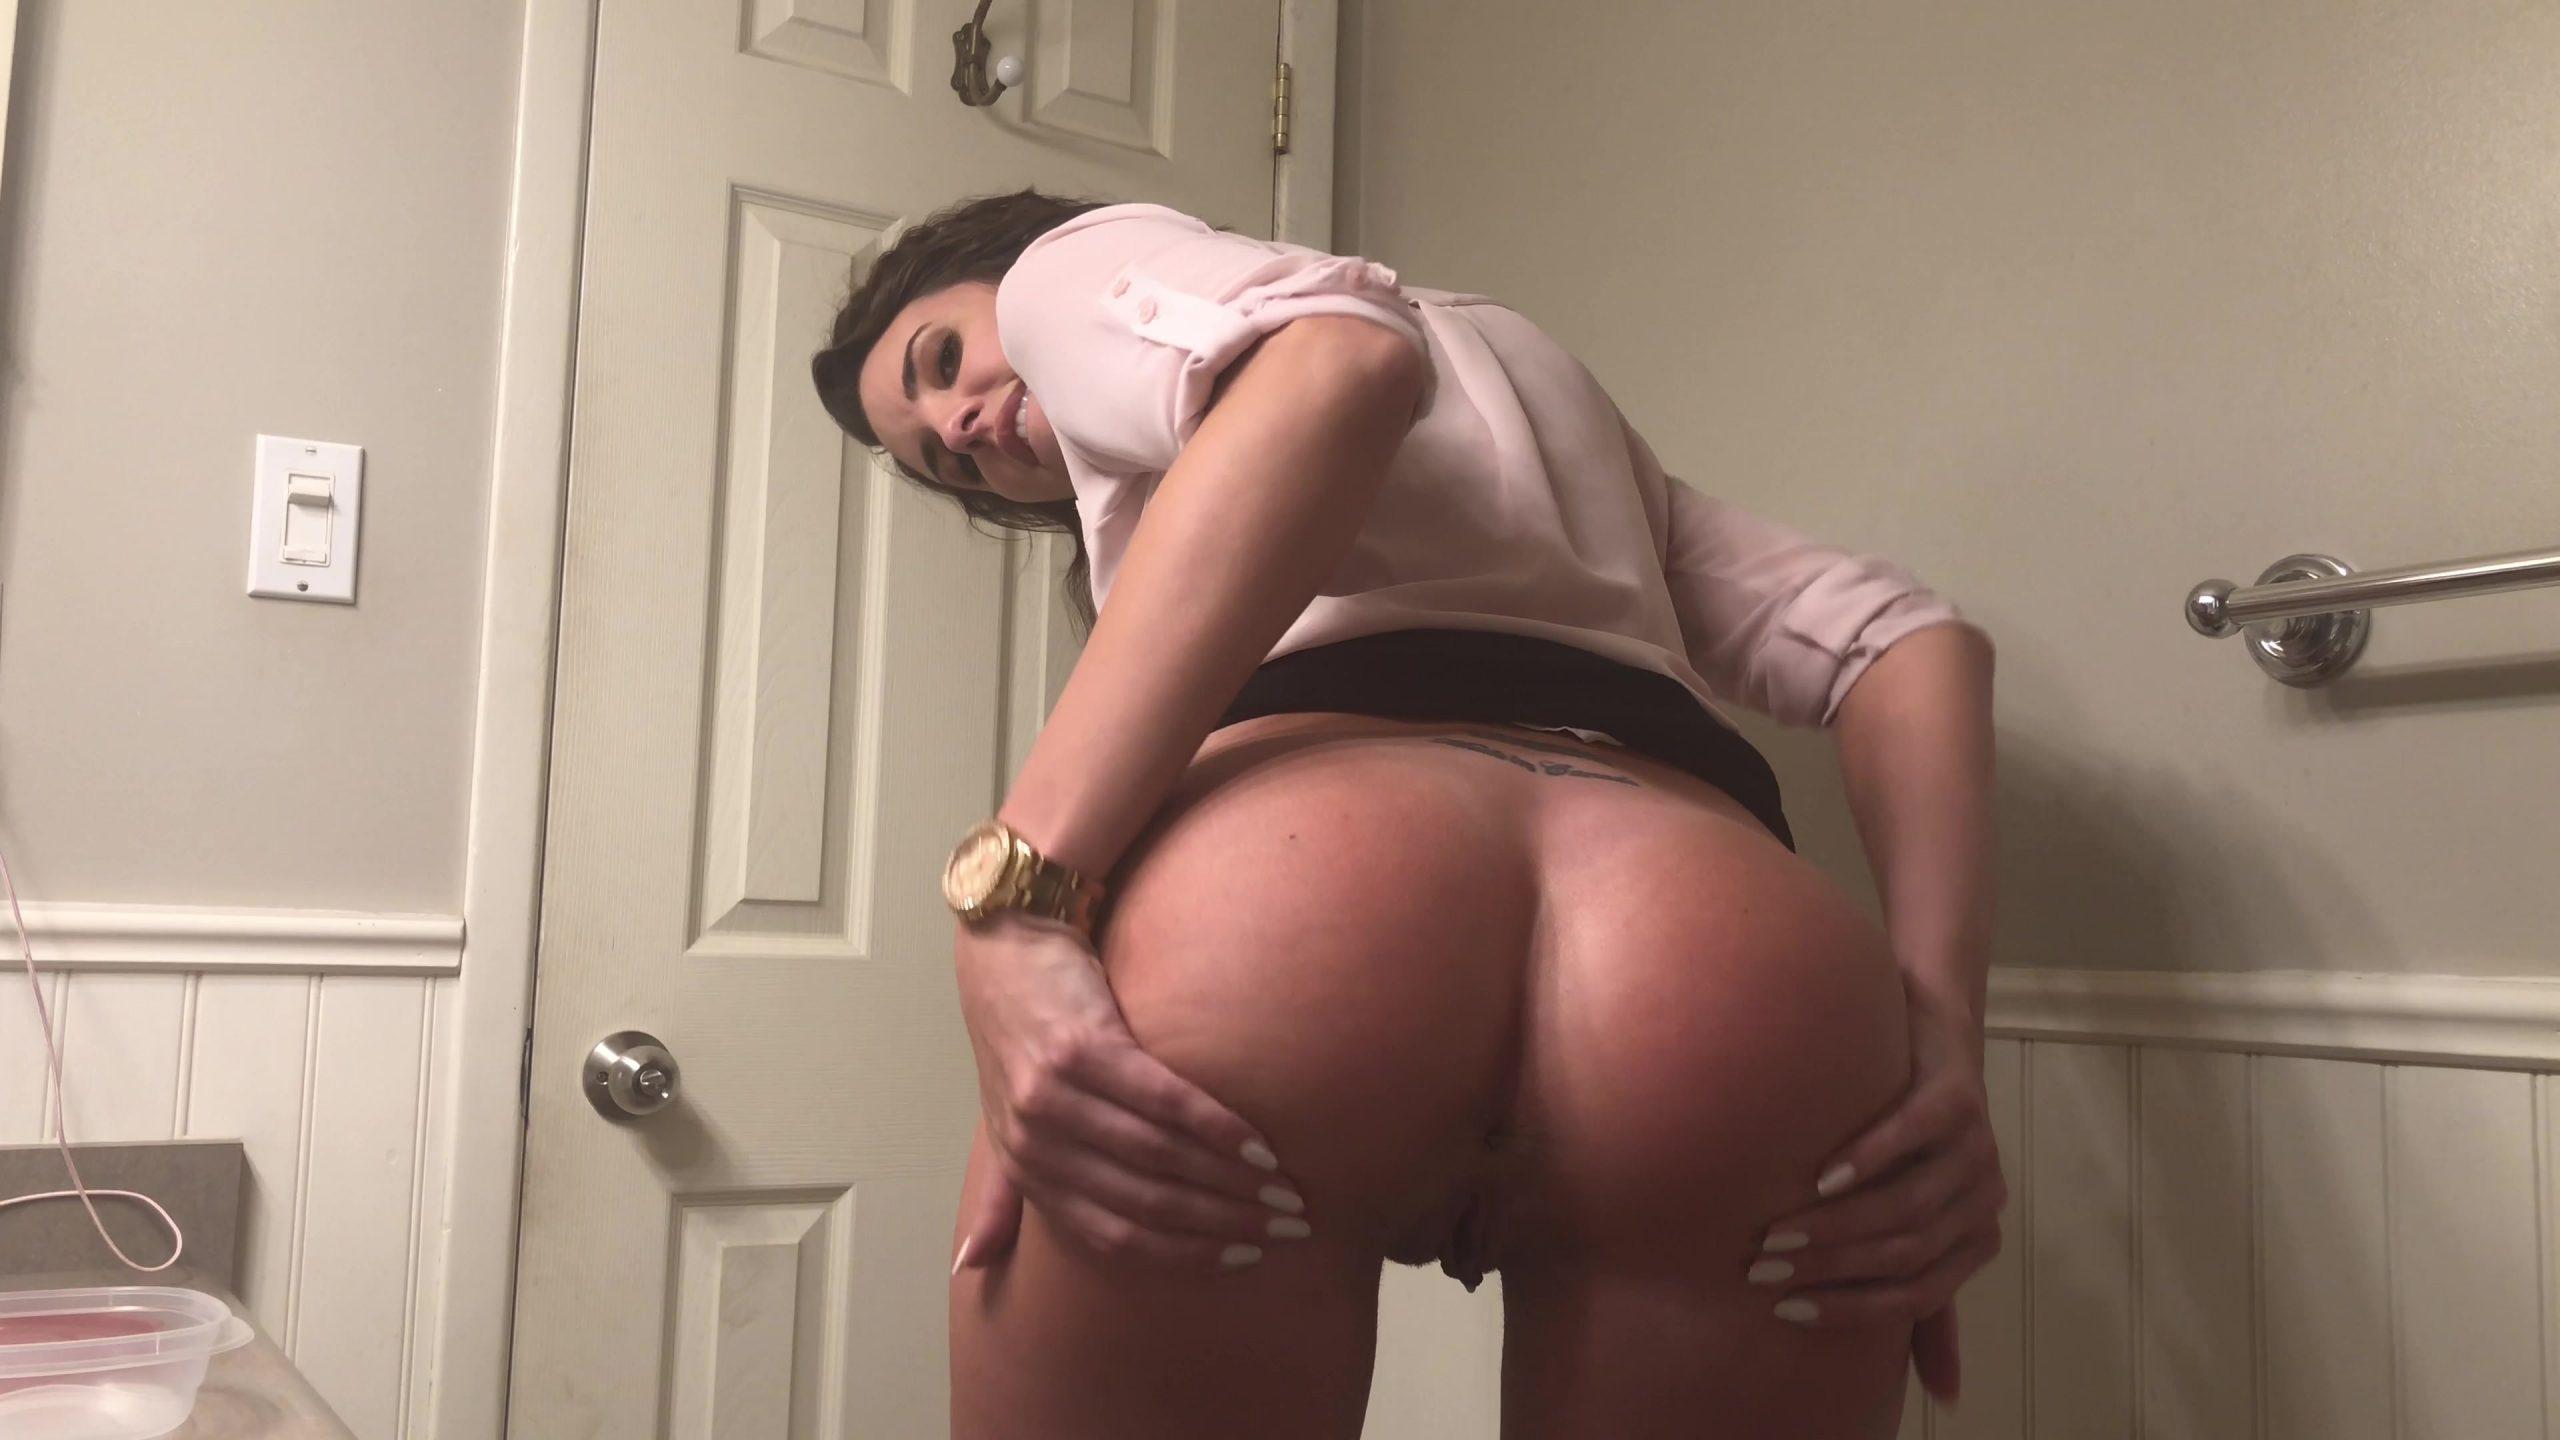 TinaAmazon_-_After_work_pink_blouse_big_shit.00001.jpg